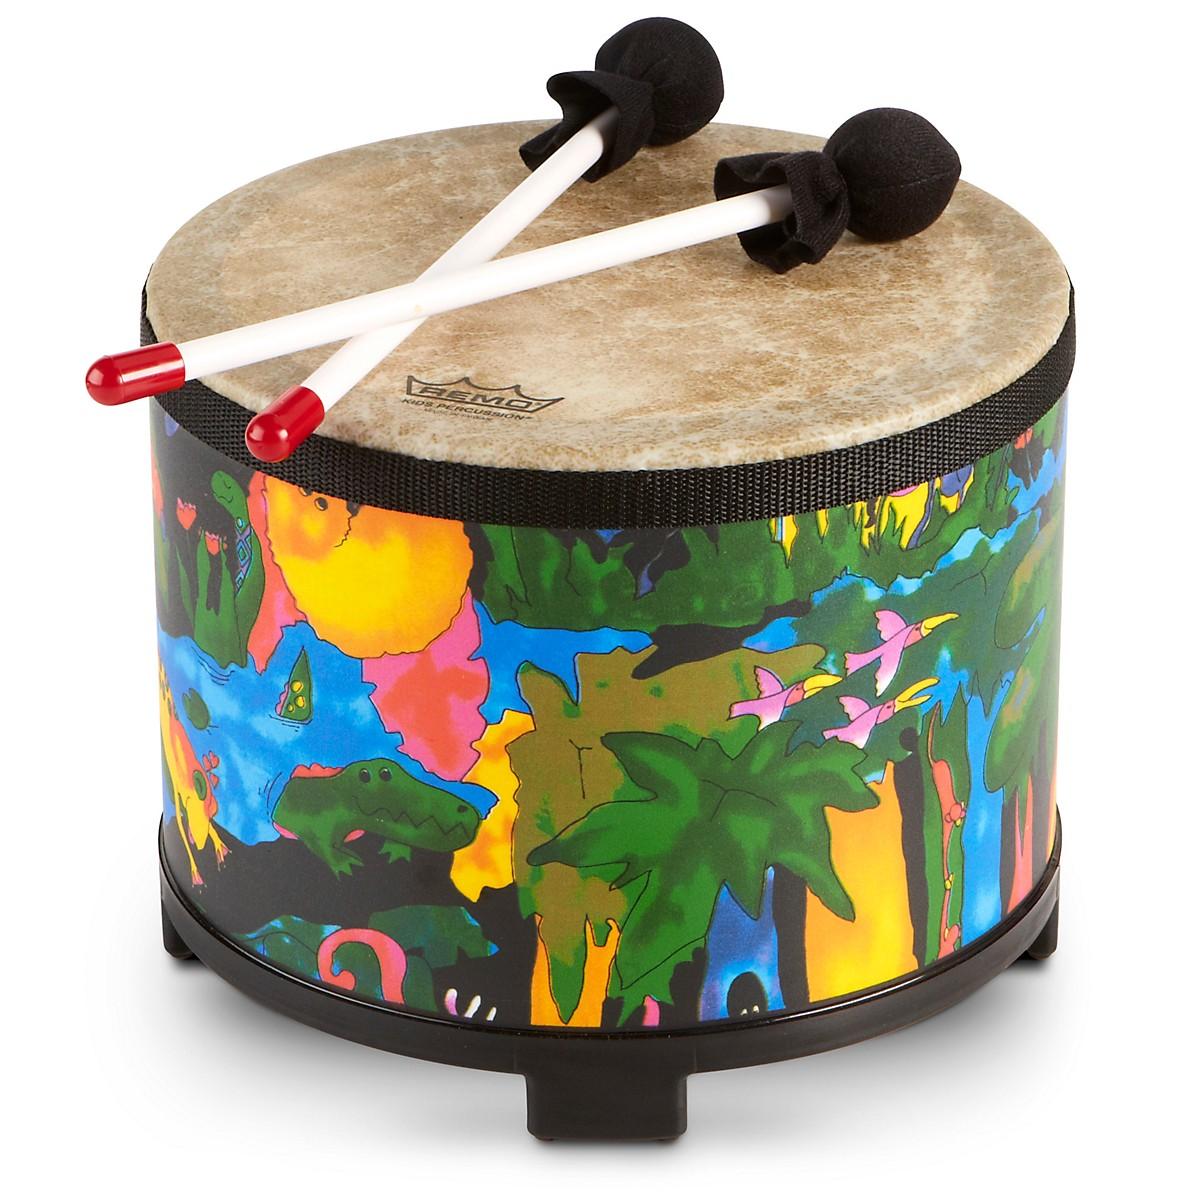 Remo Kid's Percussion Rain Forest Floor Tom